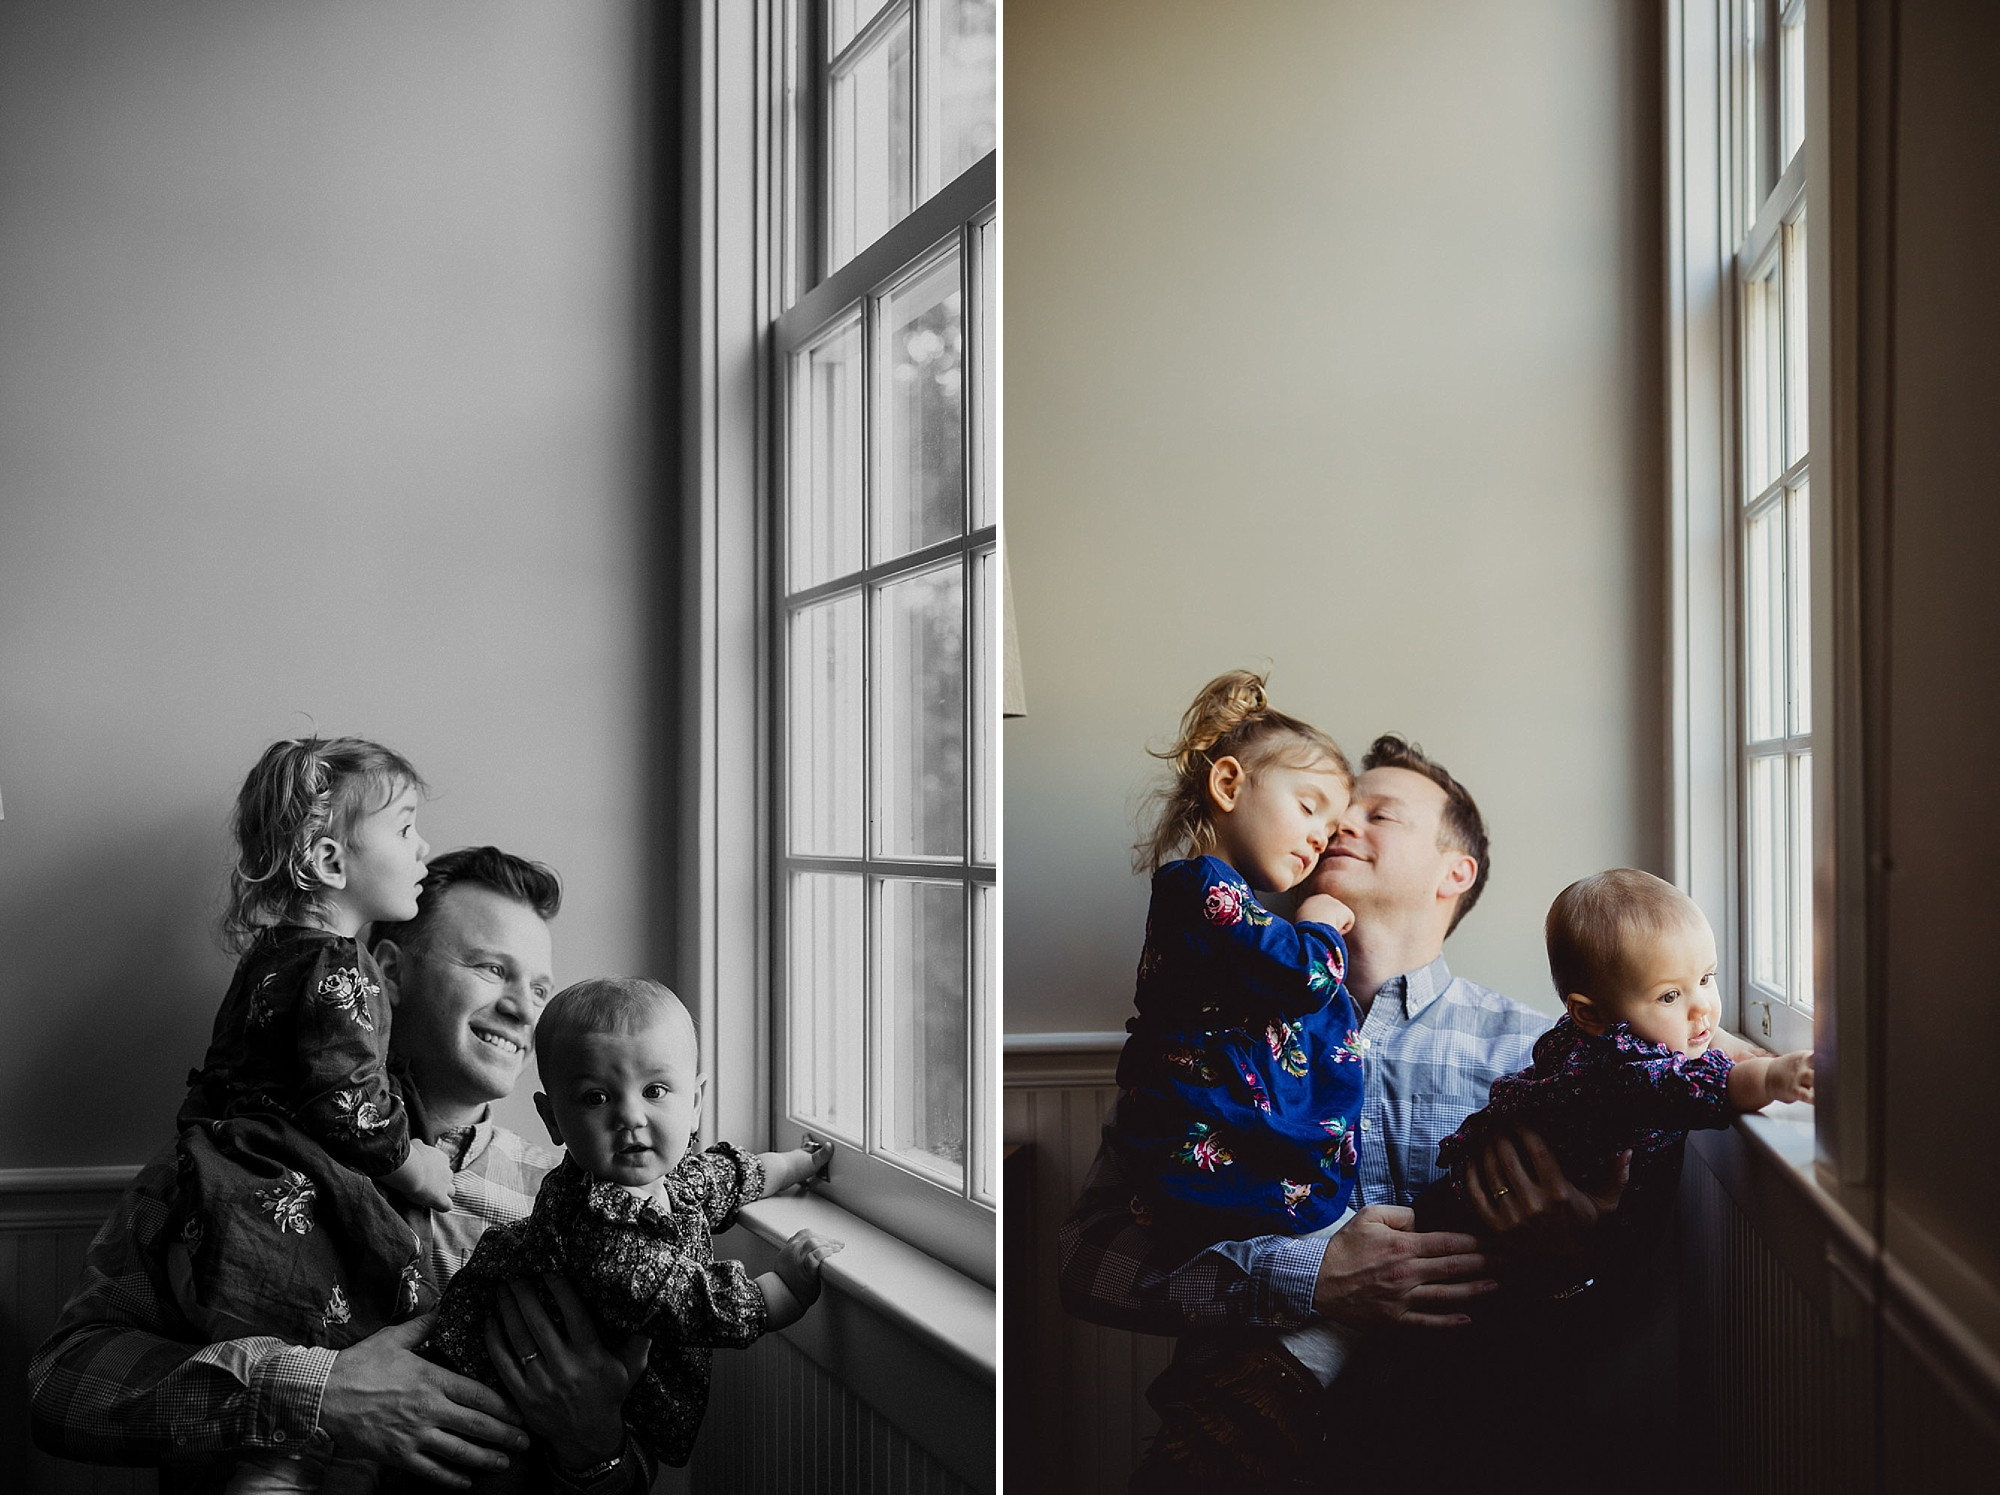 Family-photography-g-3-2.jpg